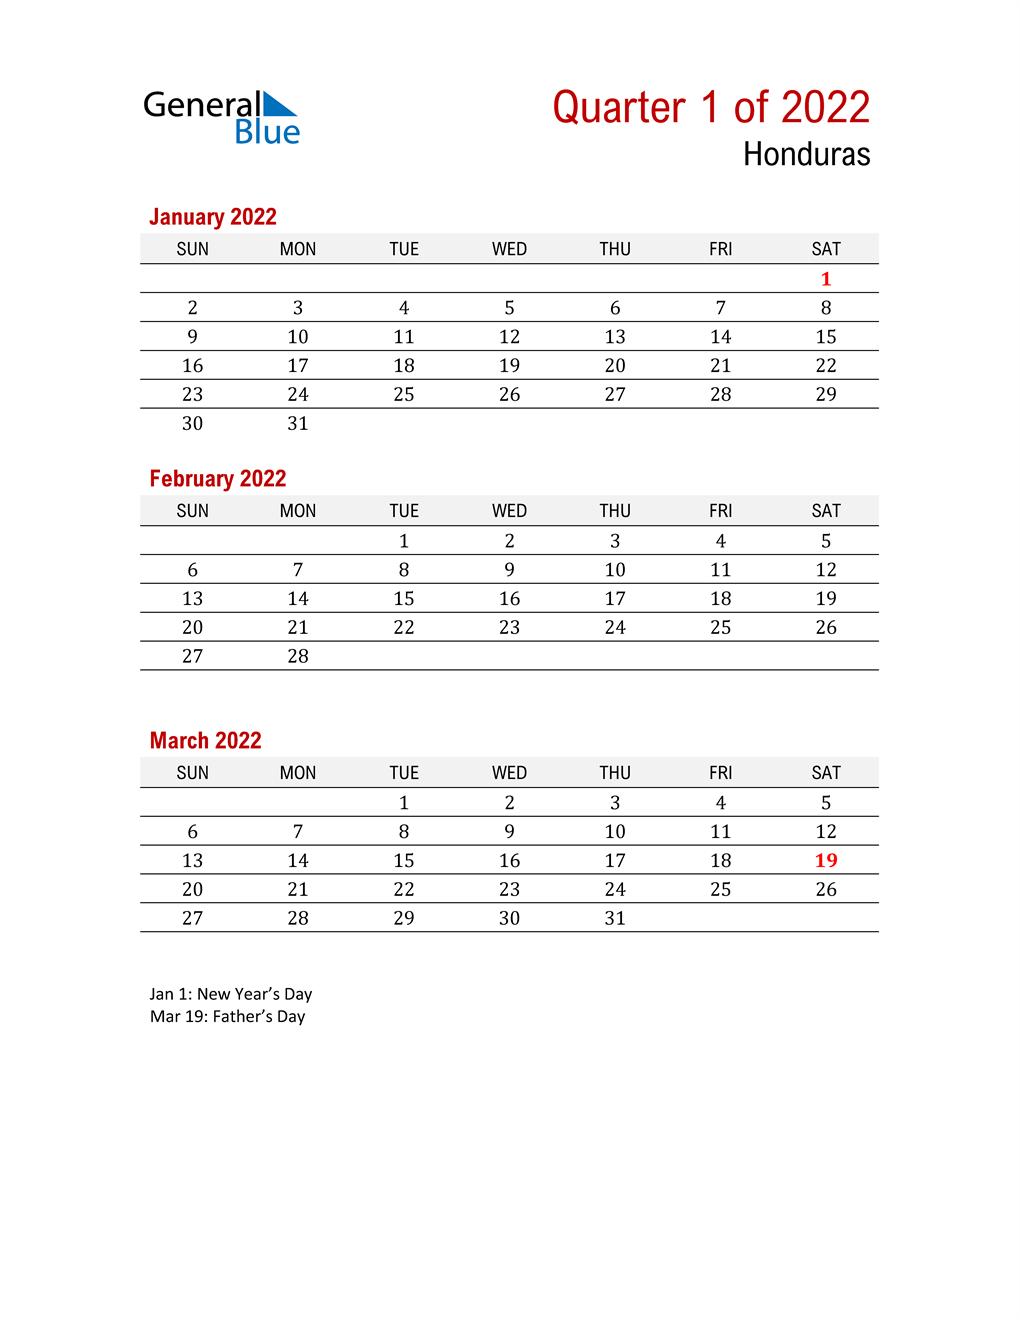 Printable Three Month Calendar for Honduras